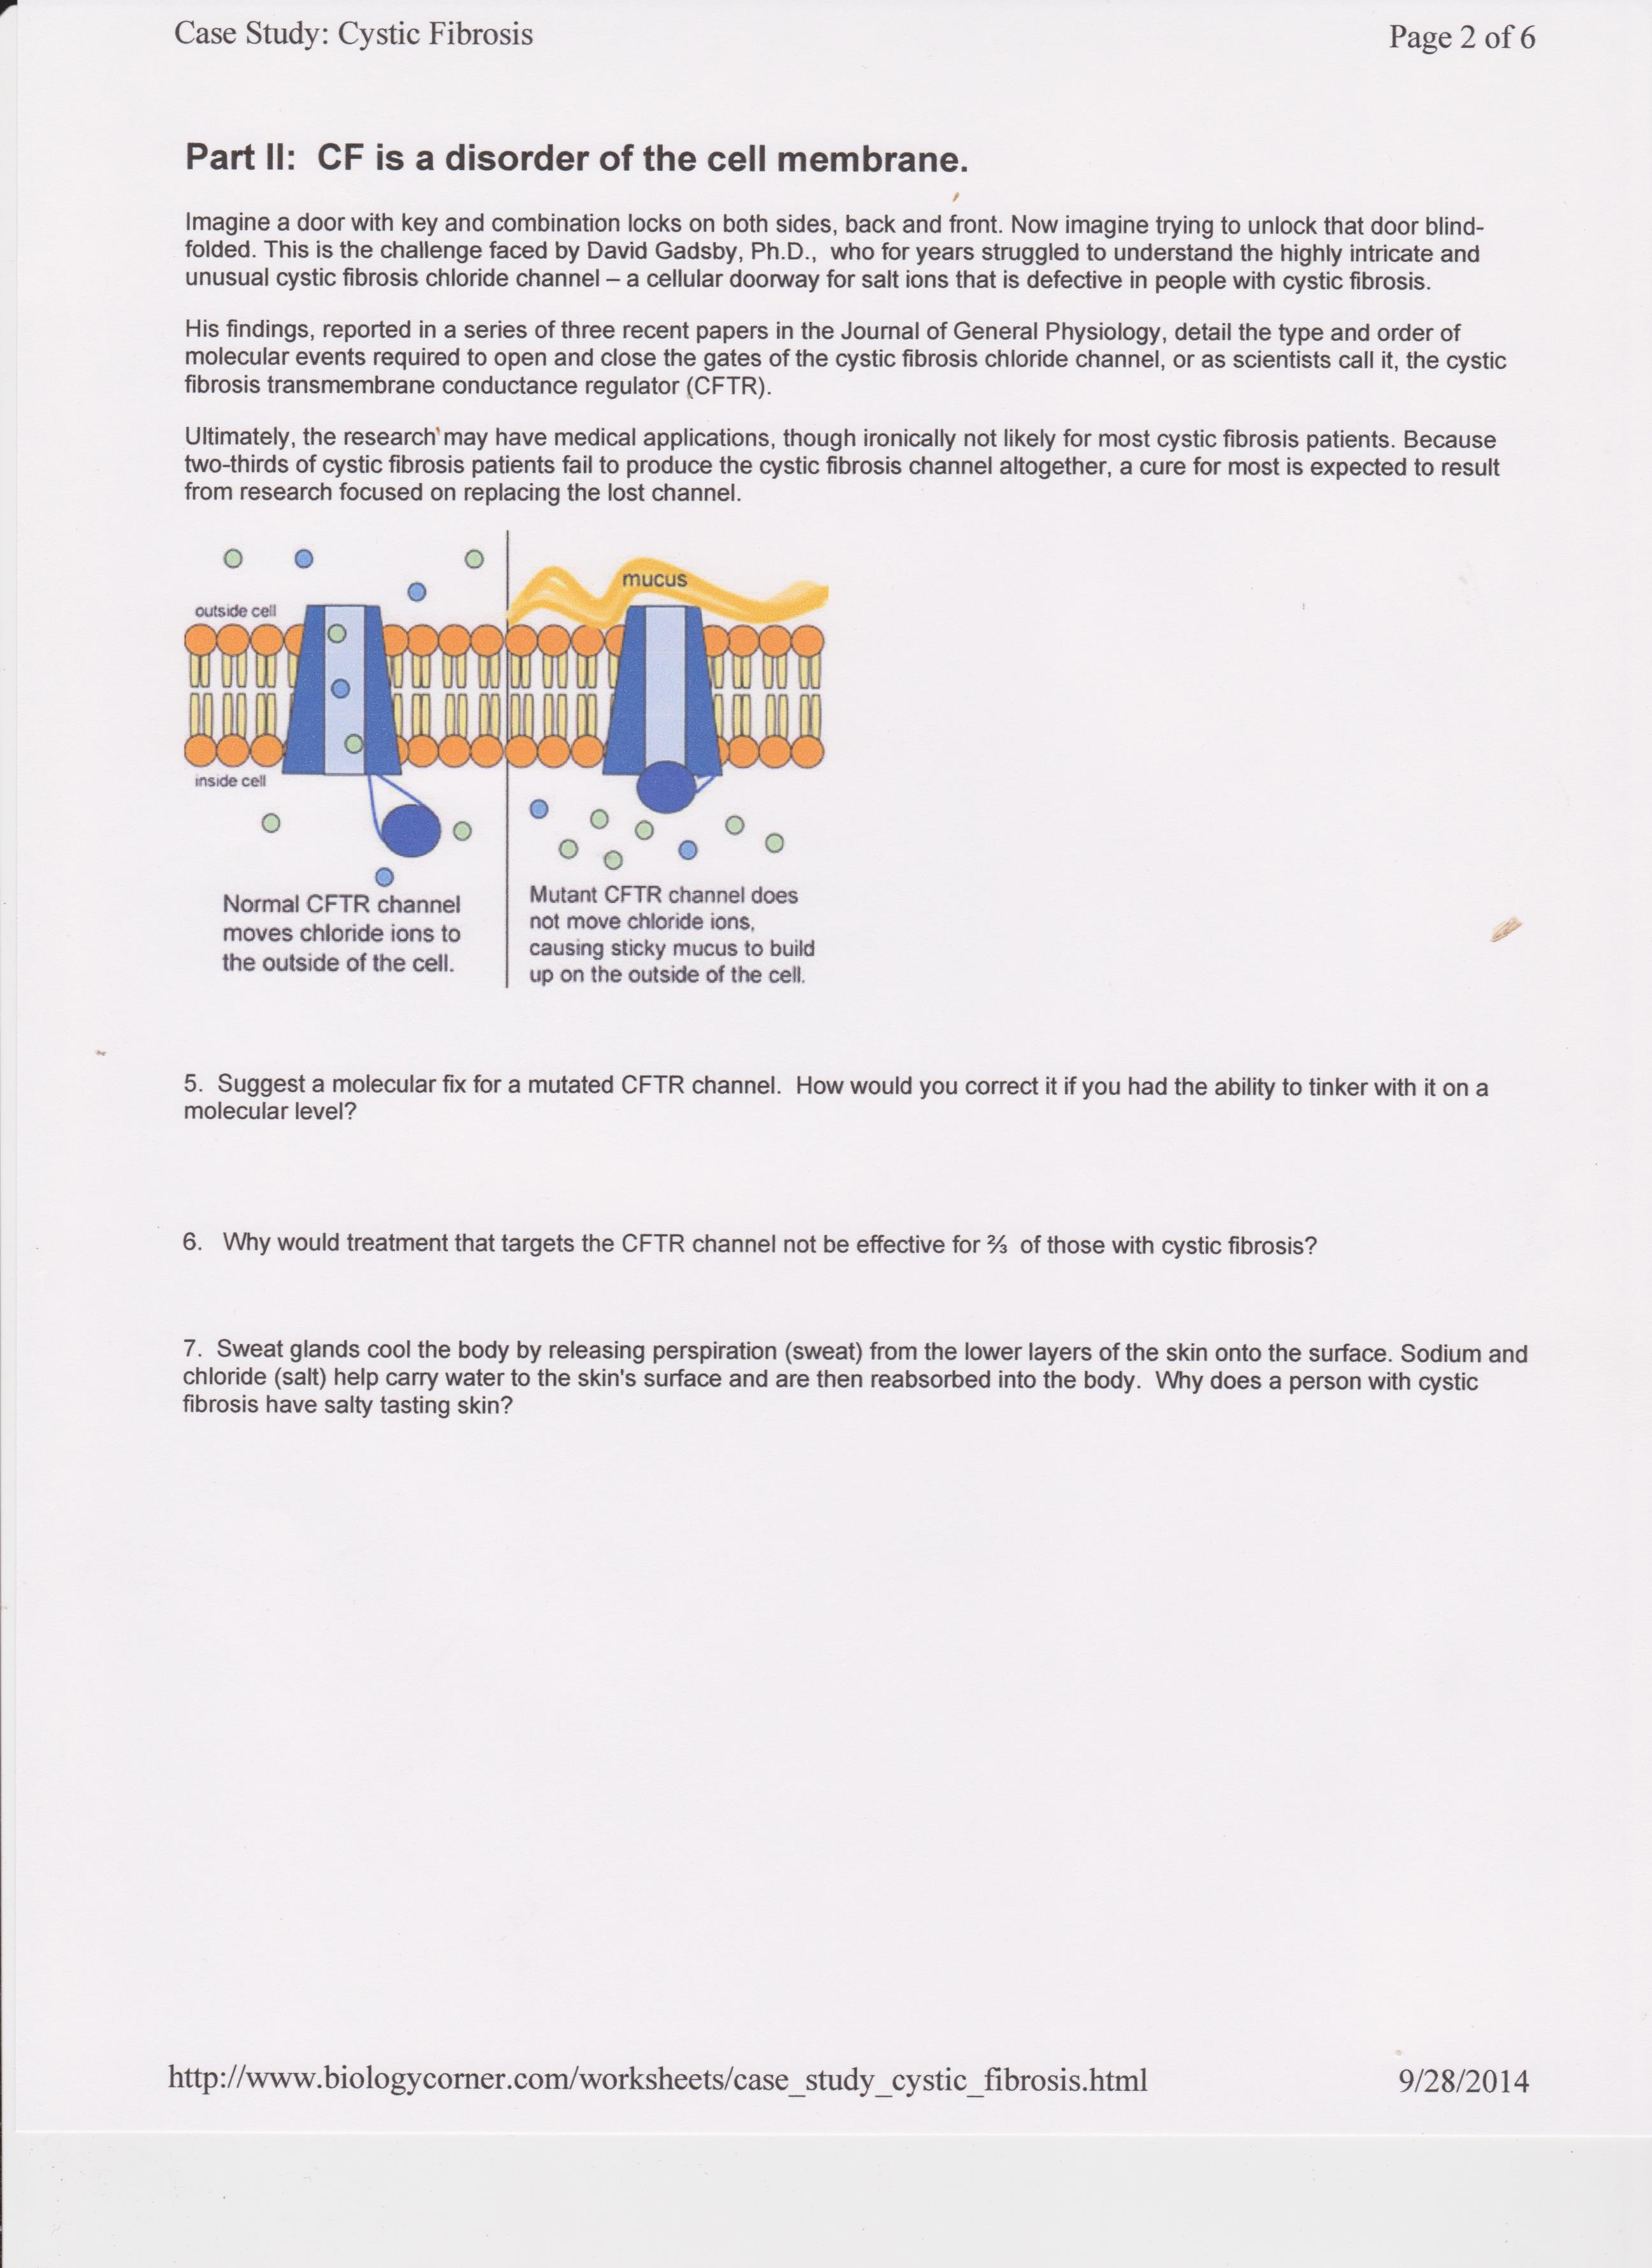 Cystic Fibrosis Case Study Flashcards